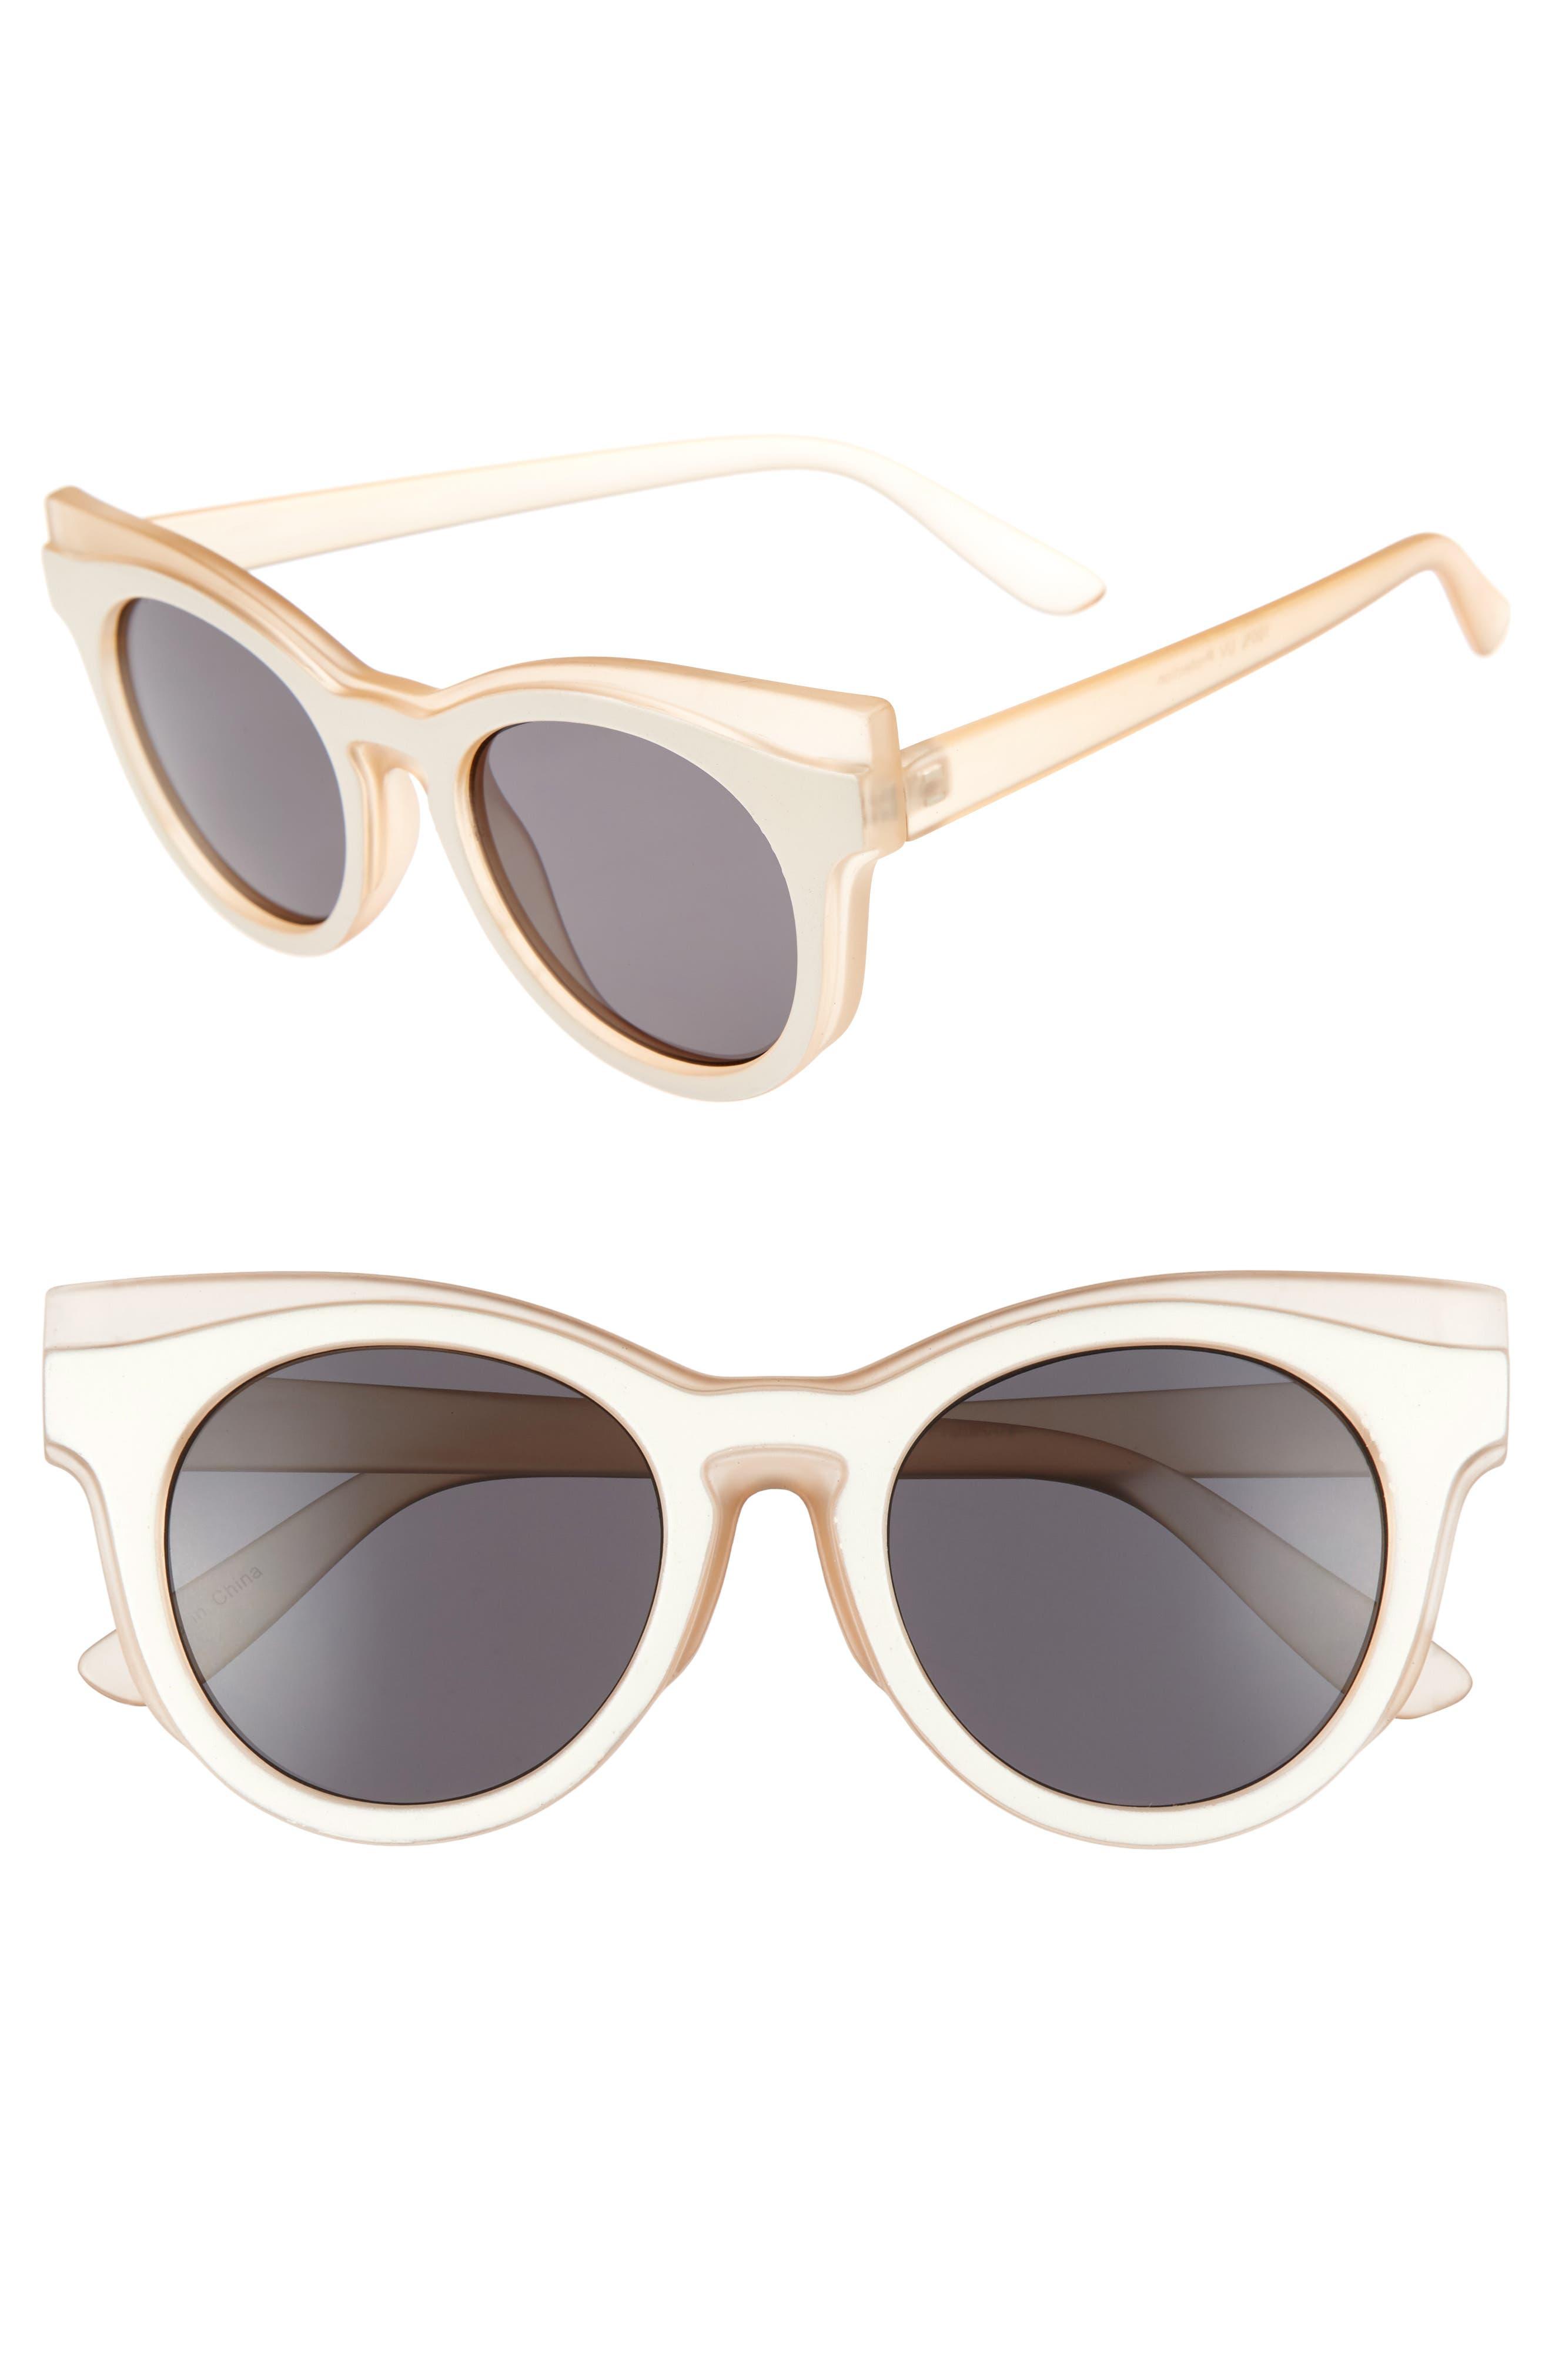 BP. 50mm Two Tone Round Lens Sunglasses